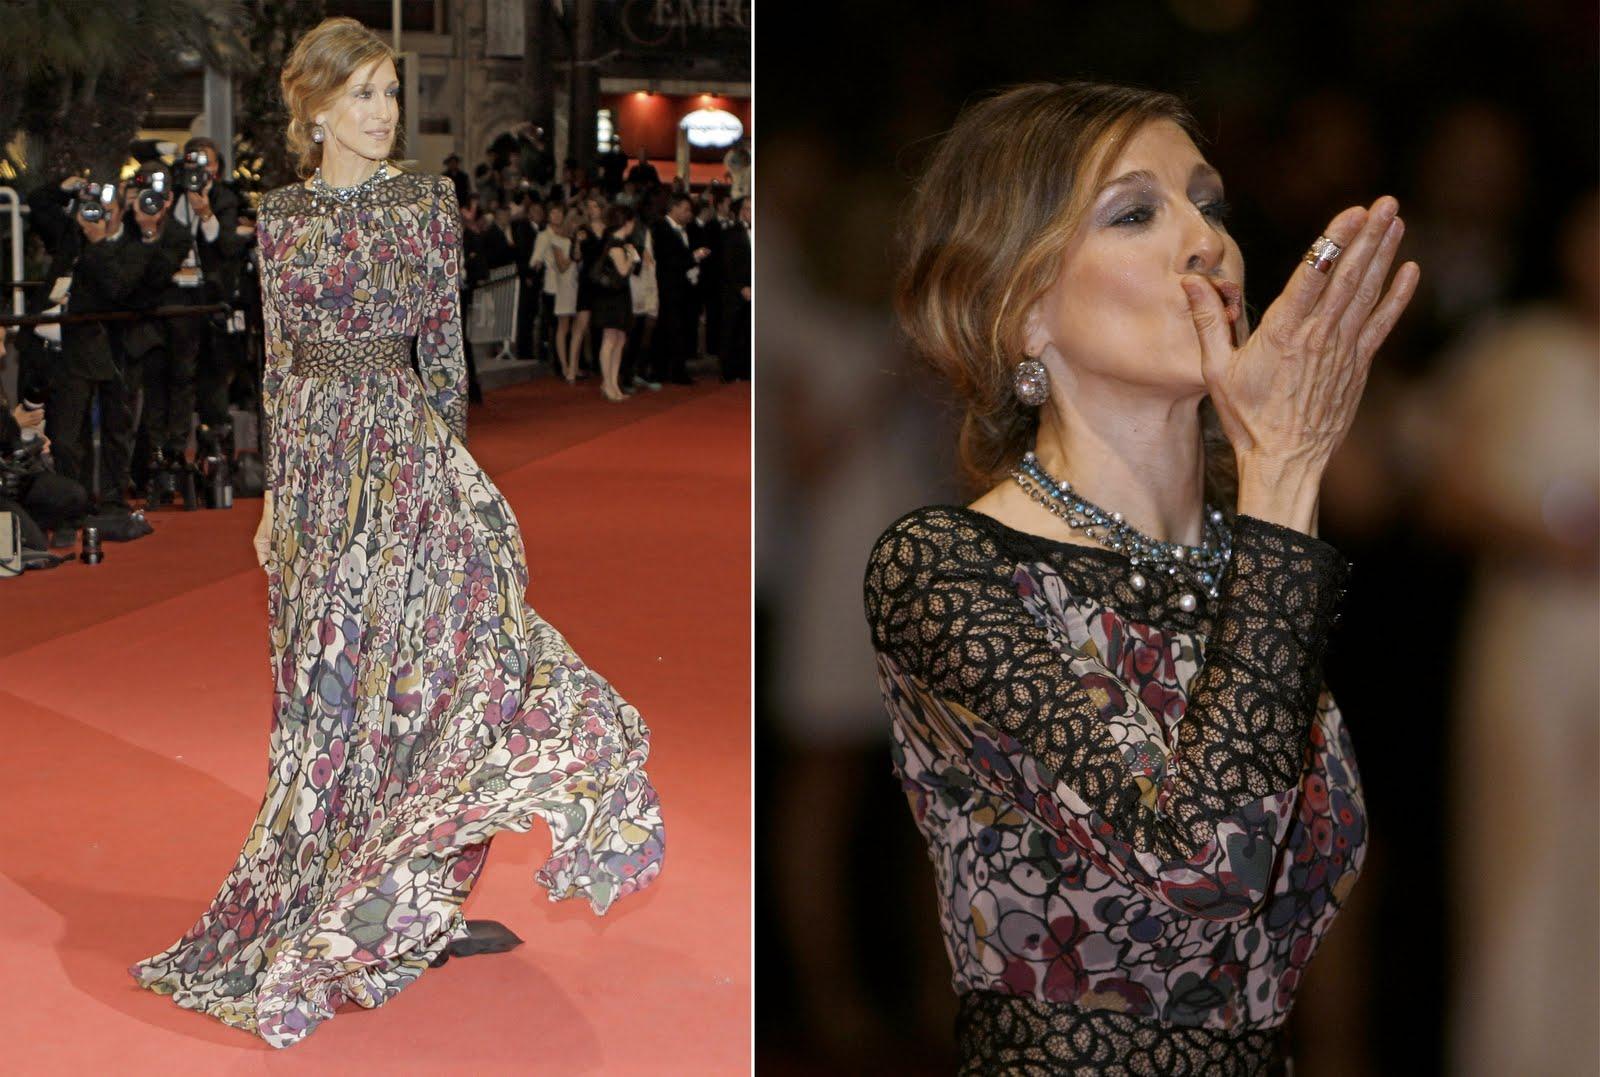 http://3.bp.blogspot.com/-nGJeKxrjc8U/TfPV8pjHzhI/AAAAAAAAAW0/mDLUEdjv6gk/s1600/05+vestidos+madrinha_sarah_jessica_parker.jpg